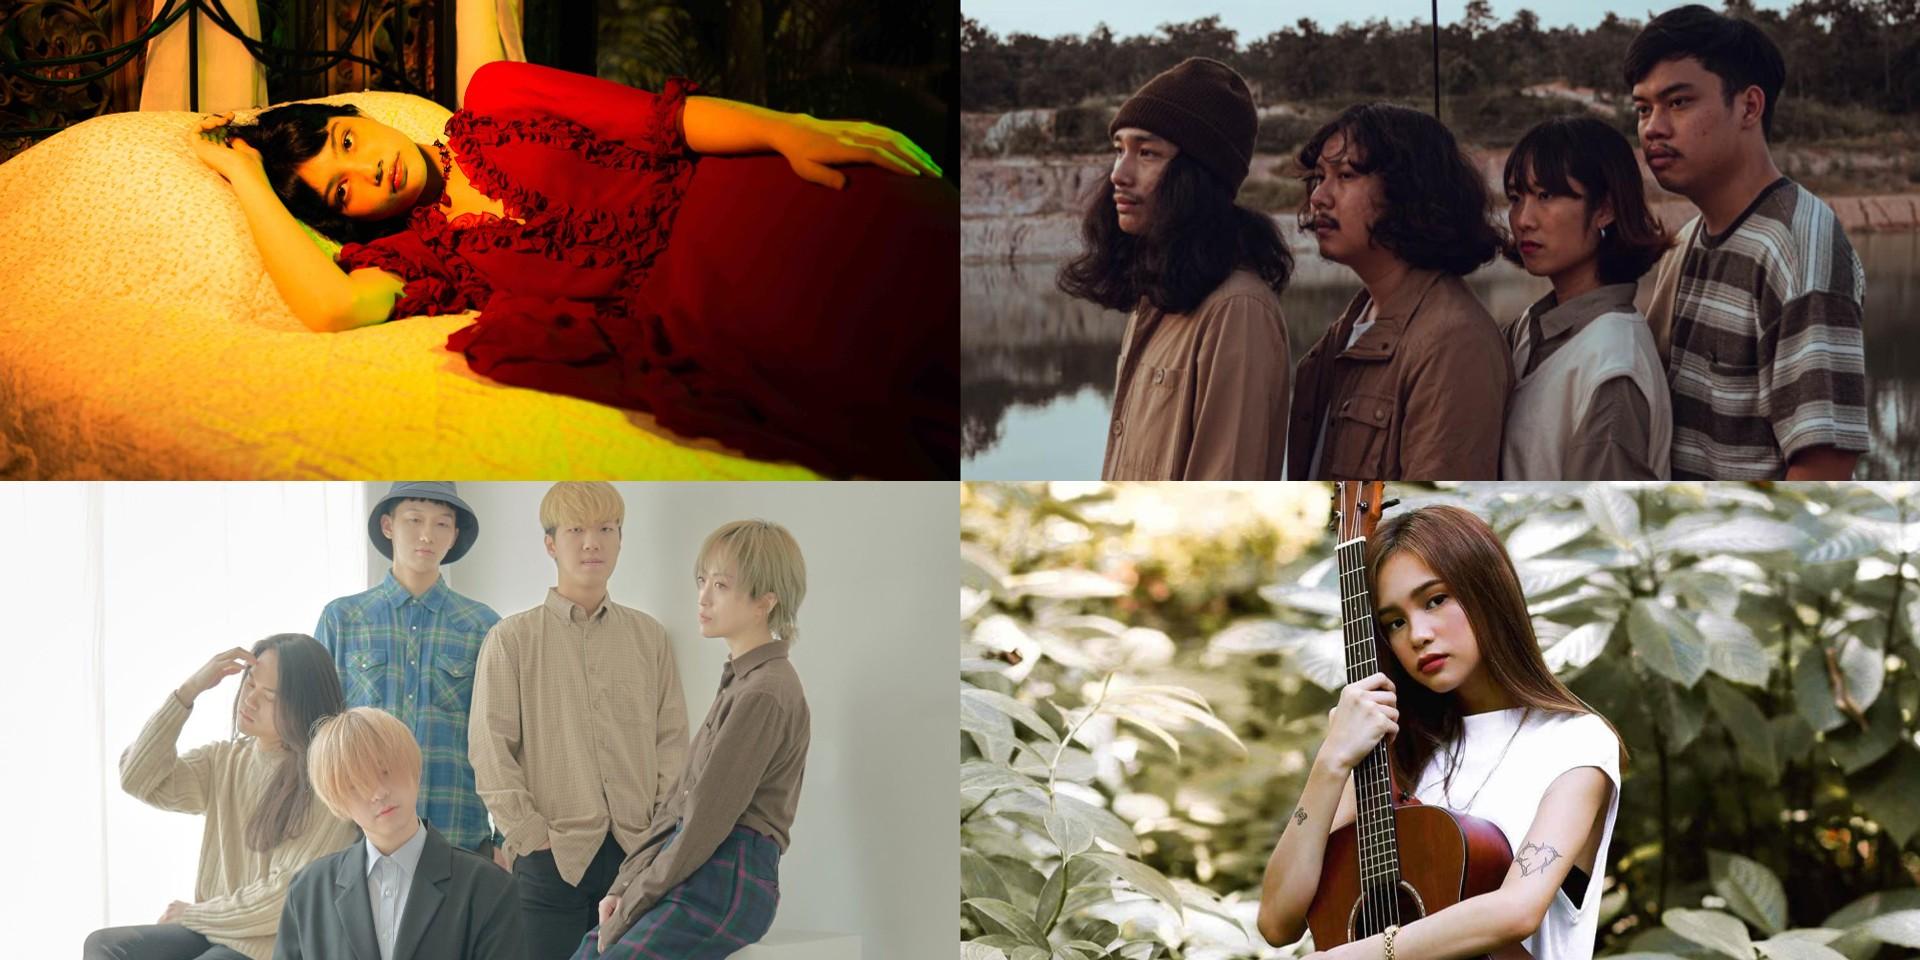 Shye, YONLAPA, Cotoba, Syd Hartha, and more regional artists announced for Trans Asia Music Meeting at Music Lane Festival Okinawa 2021